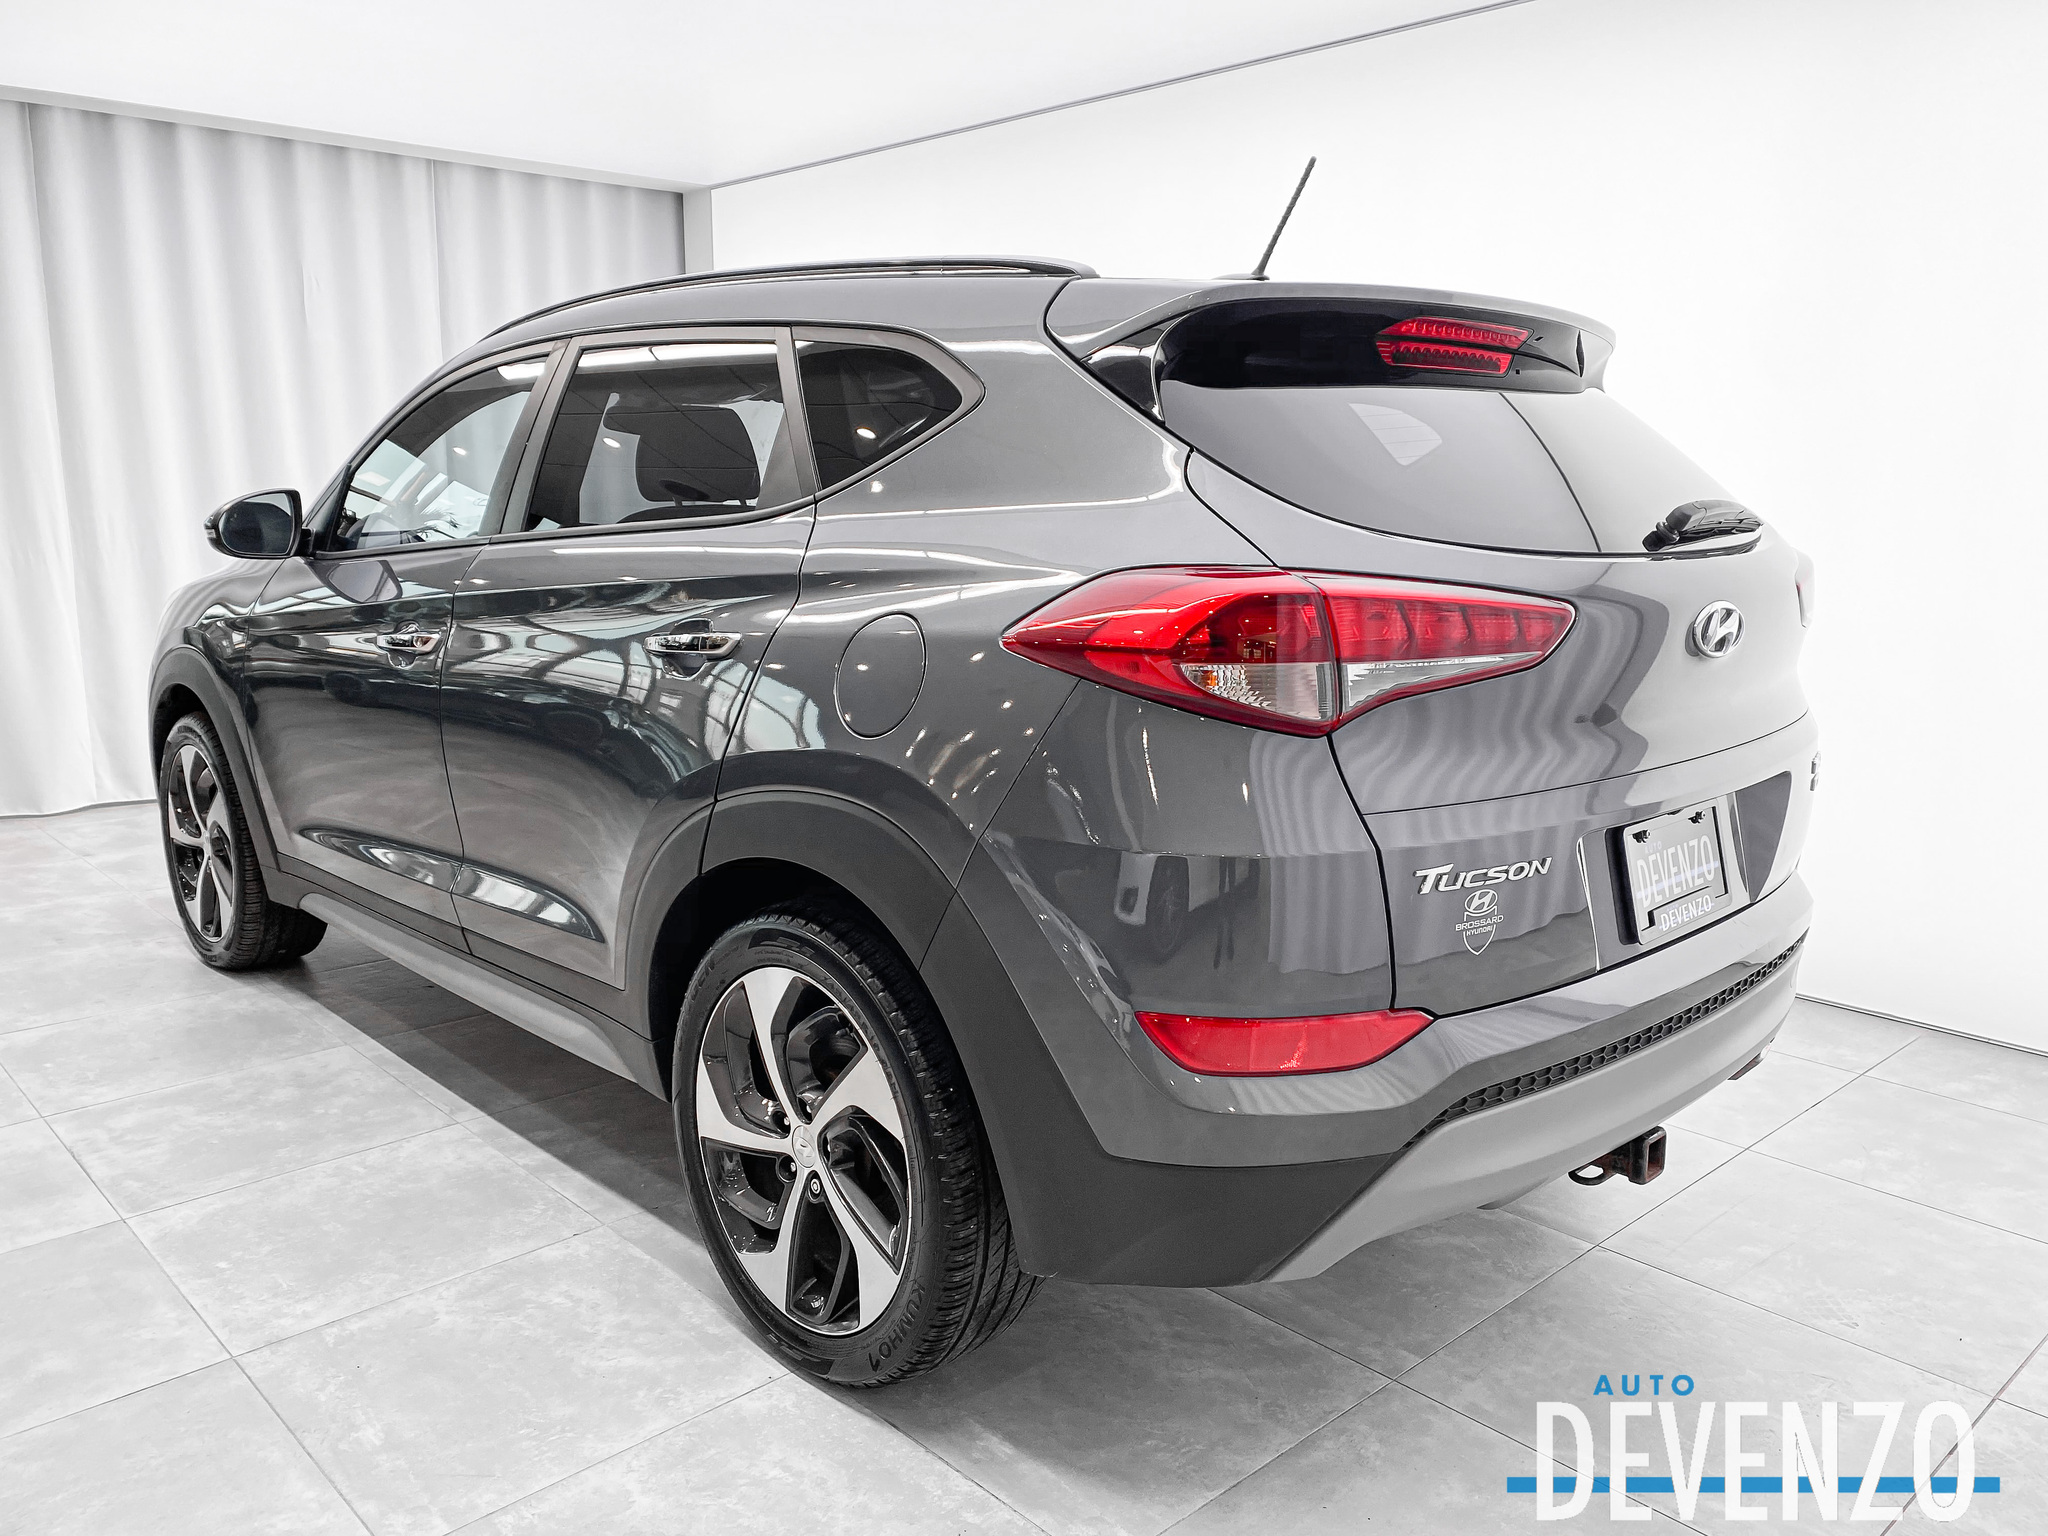 2017 Hyundai Tucson AWD 1.6L SE CUIR TOIT PANORAMIQUE CAMERA complet